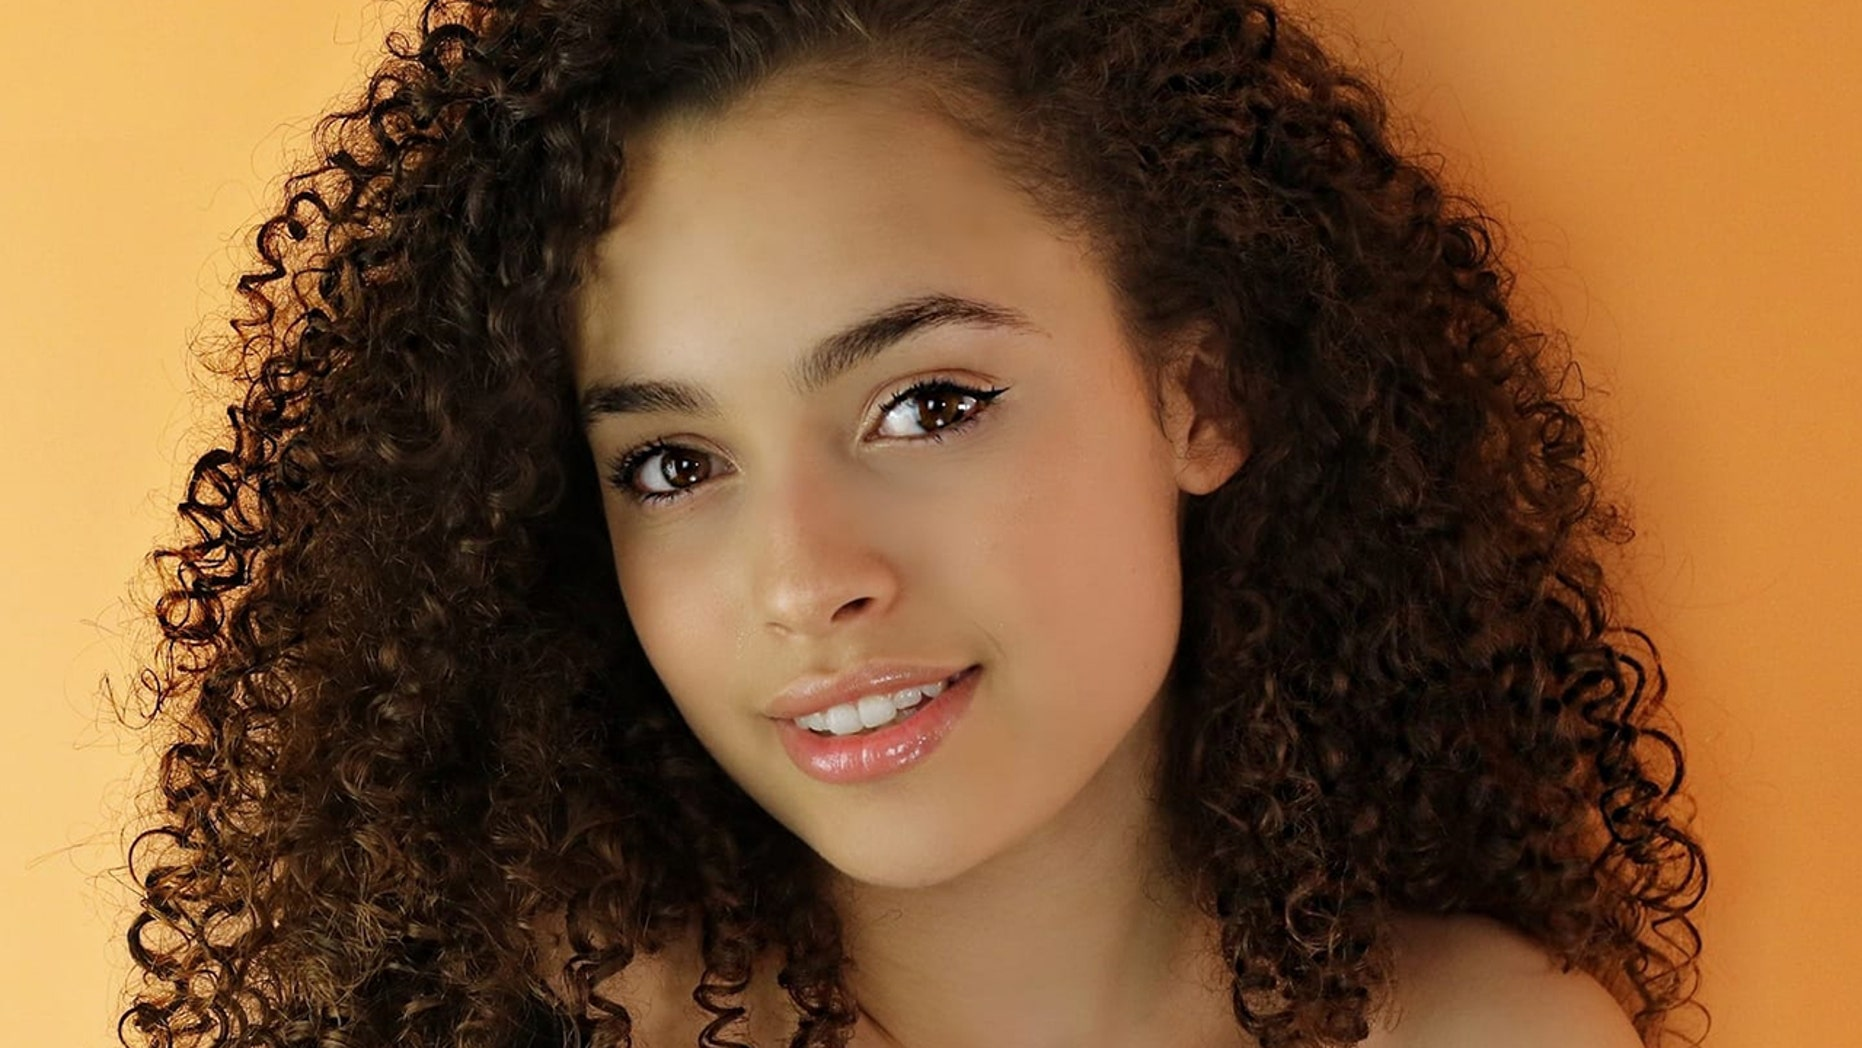 CBBC star Mya-Lecia Naylor dies aged 16